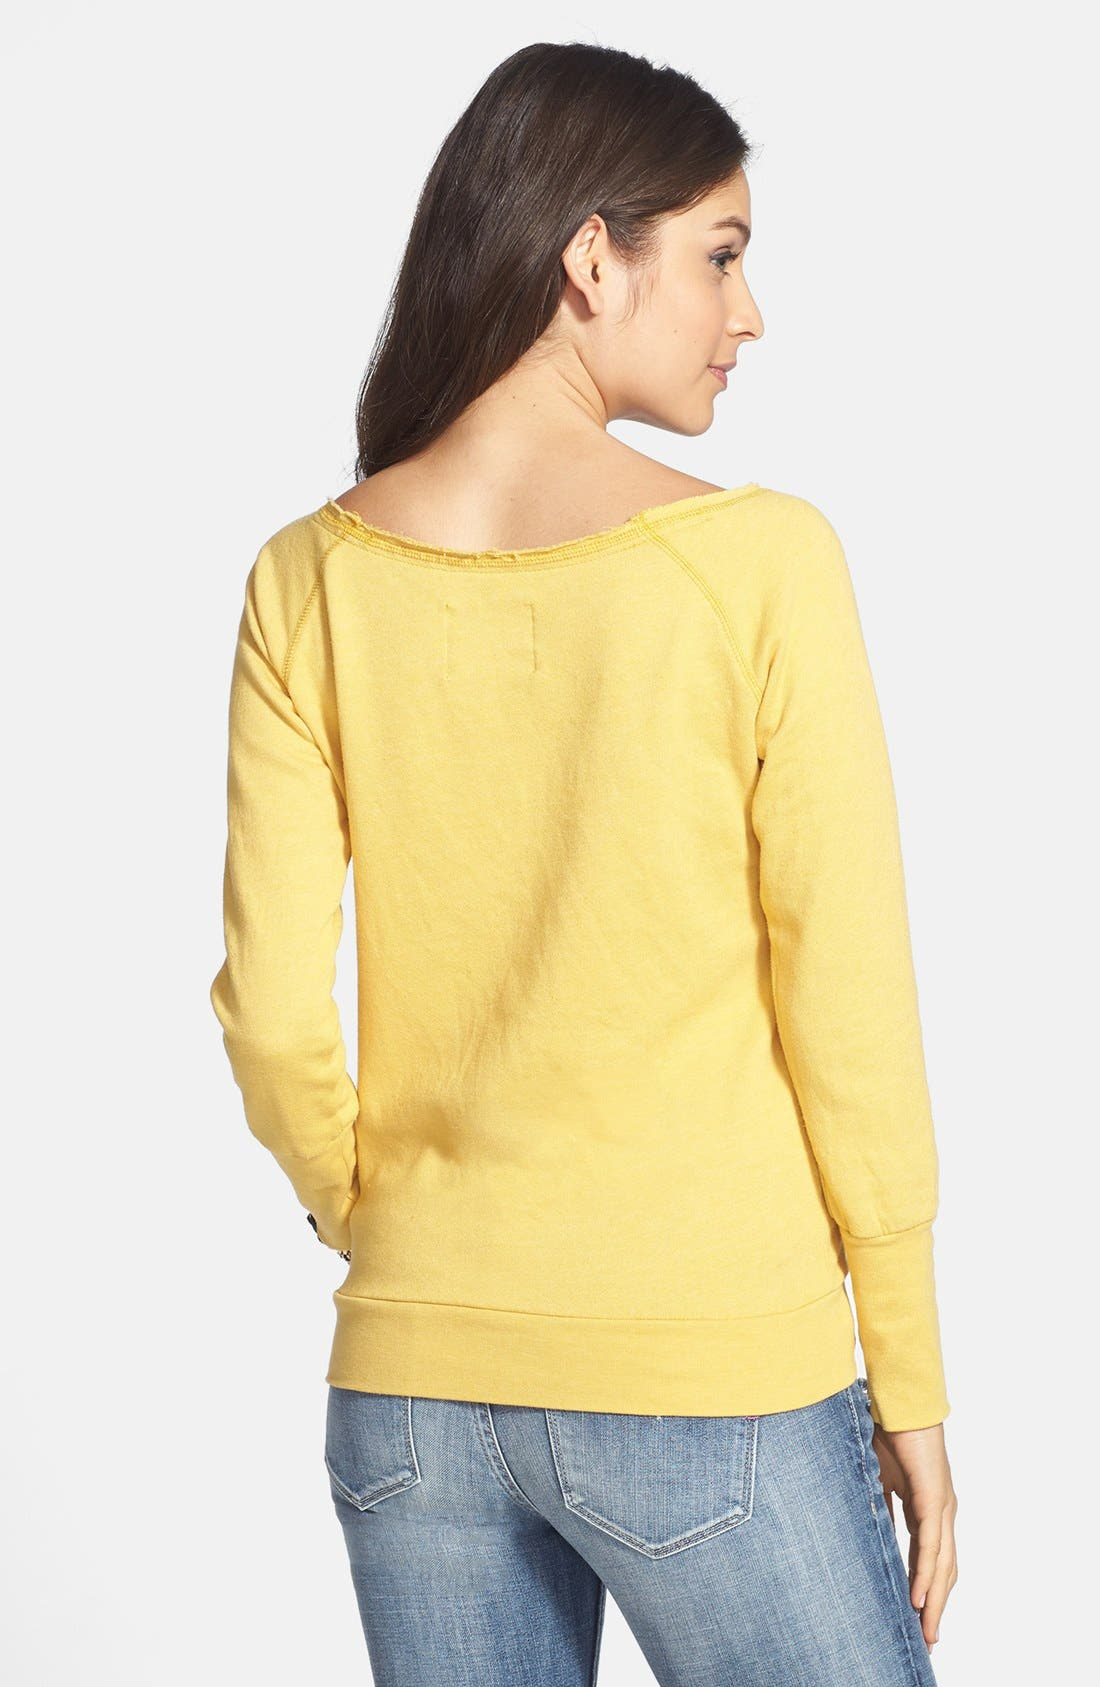 Alternate Image 2  - Sportiqe 'Los Angeles Lakers' Wide Neck Fleece Sweatshirt (Juniors) (Online Only)